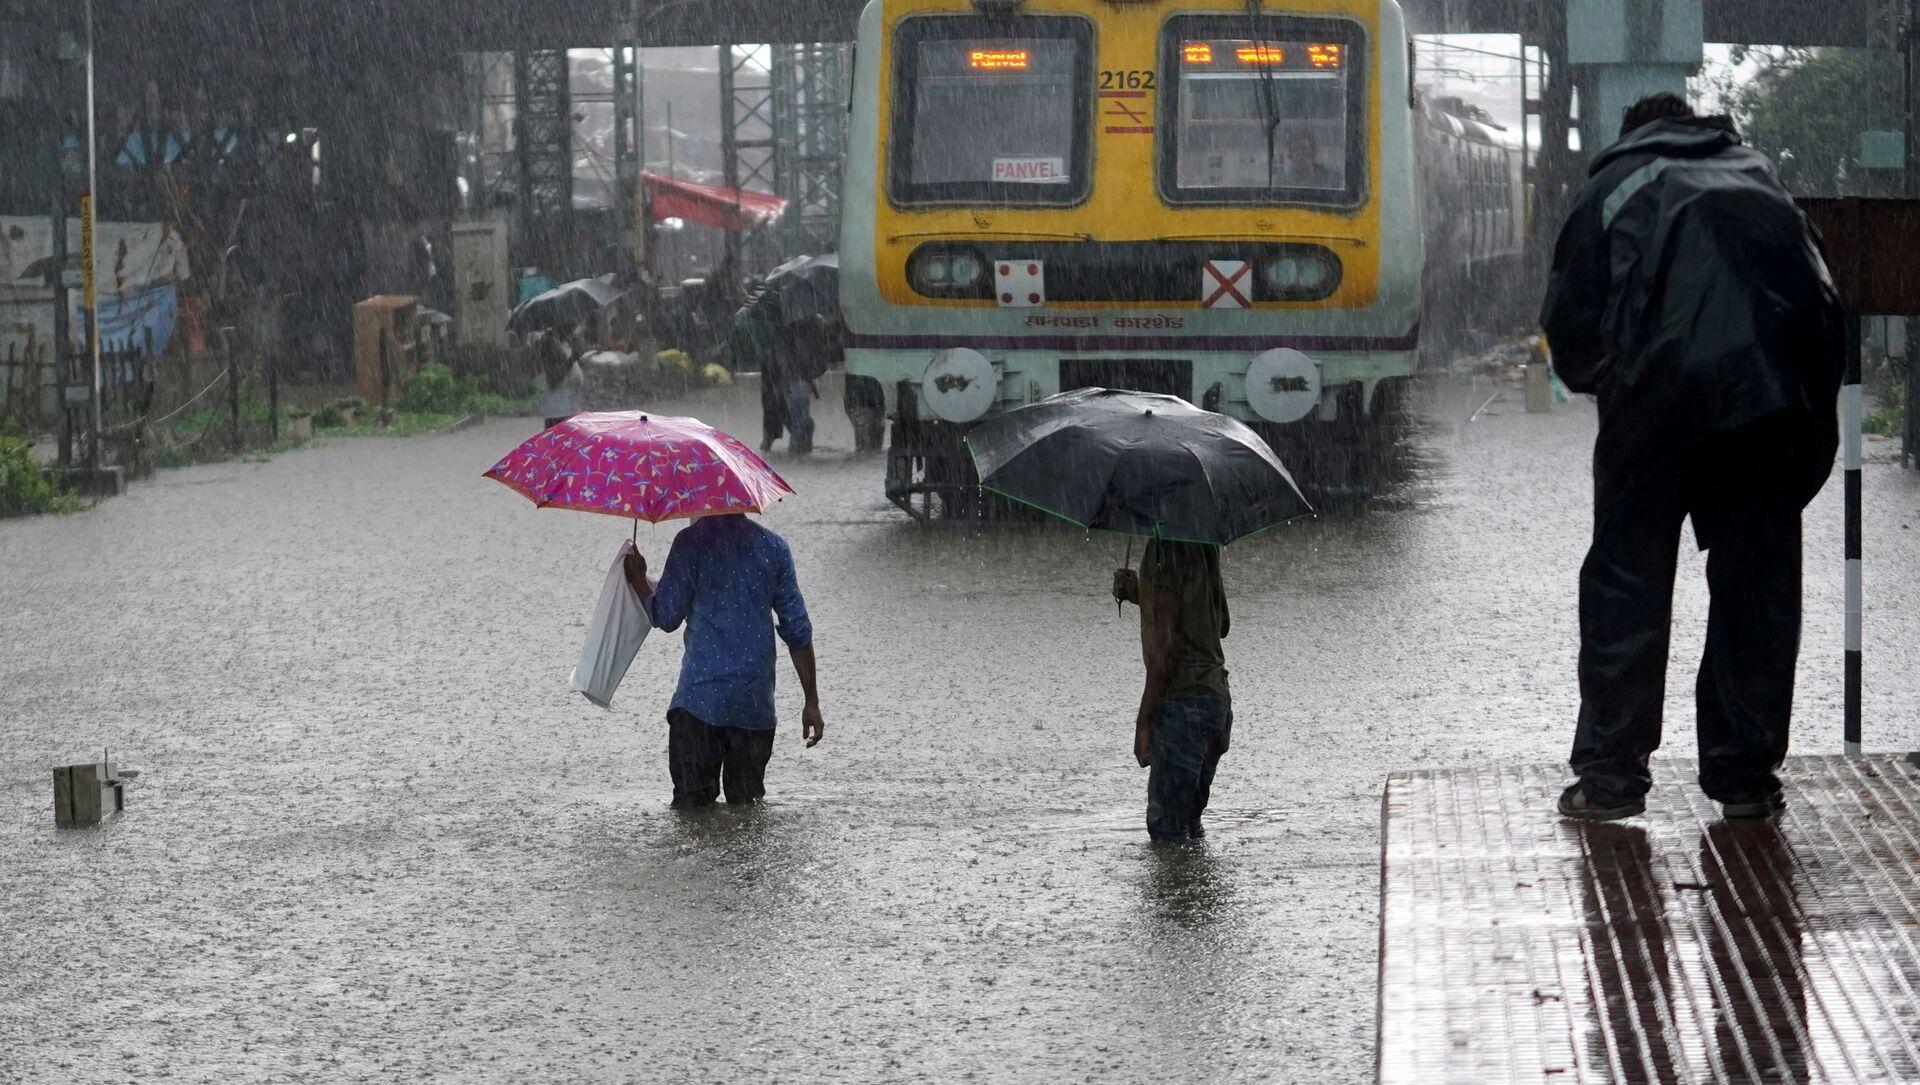 People cross inundated railway tracks next to a parked passenger train during heavy monsoon rains in Mumbai, India, June 9, 2021 - Sputnik International, 1920, 24.07.2021